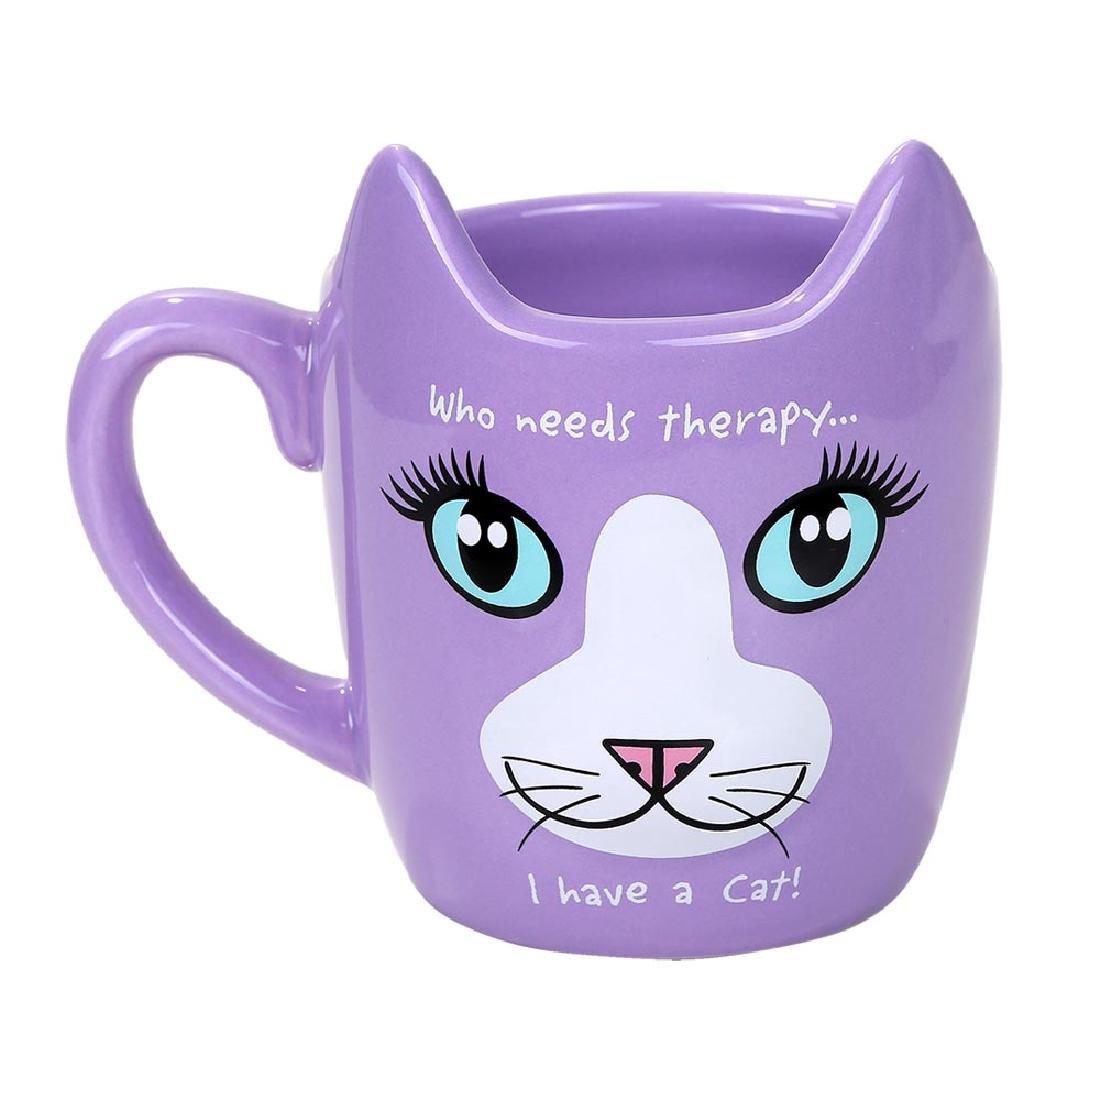 THERAPY CAT MUG